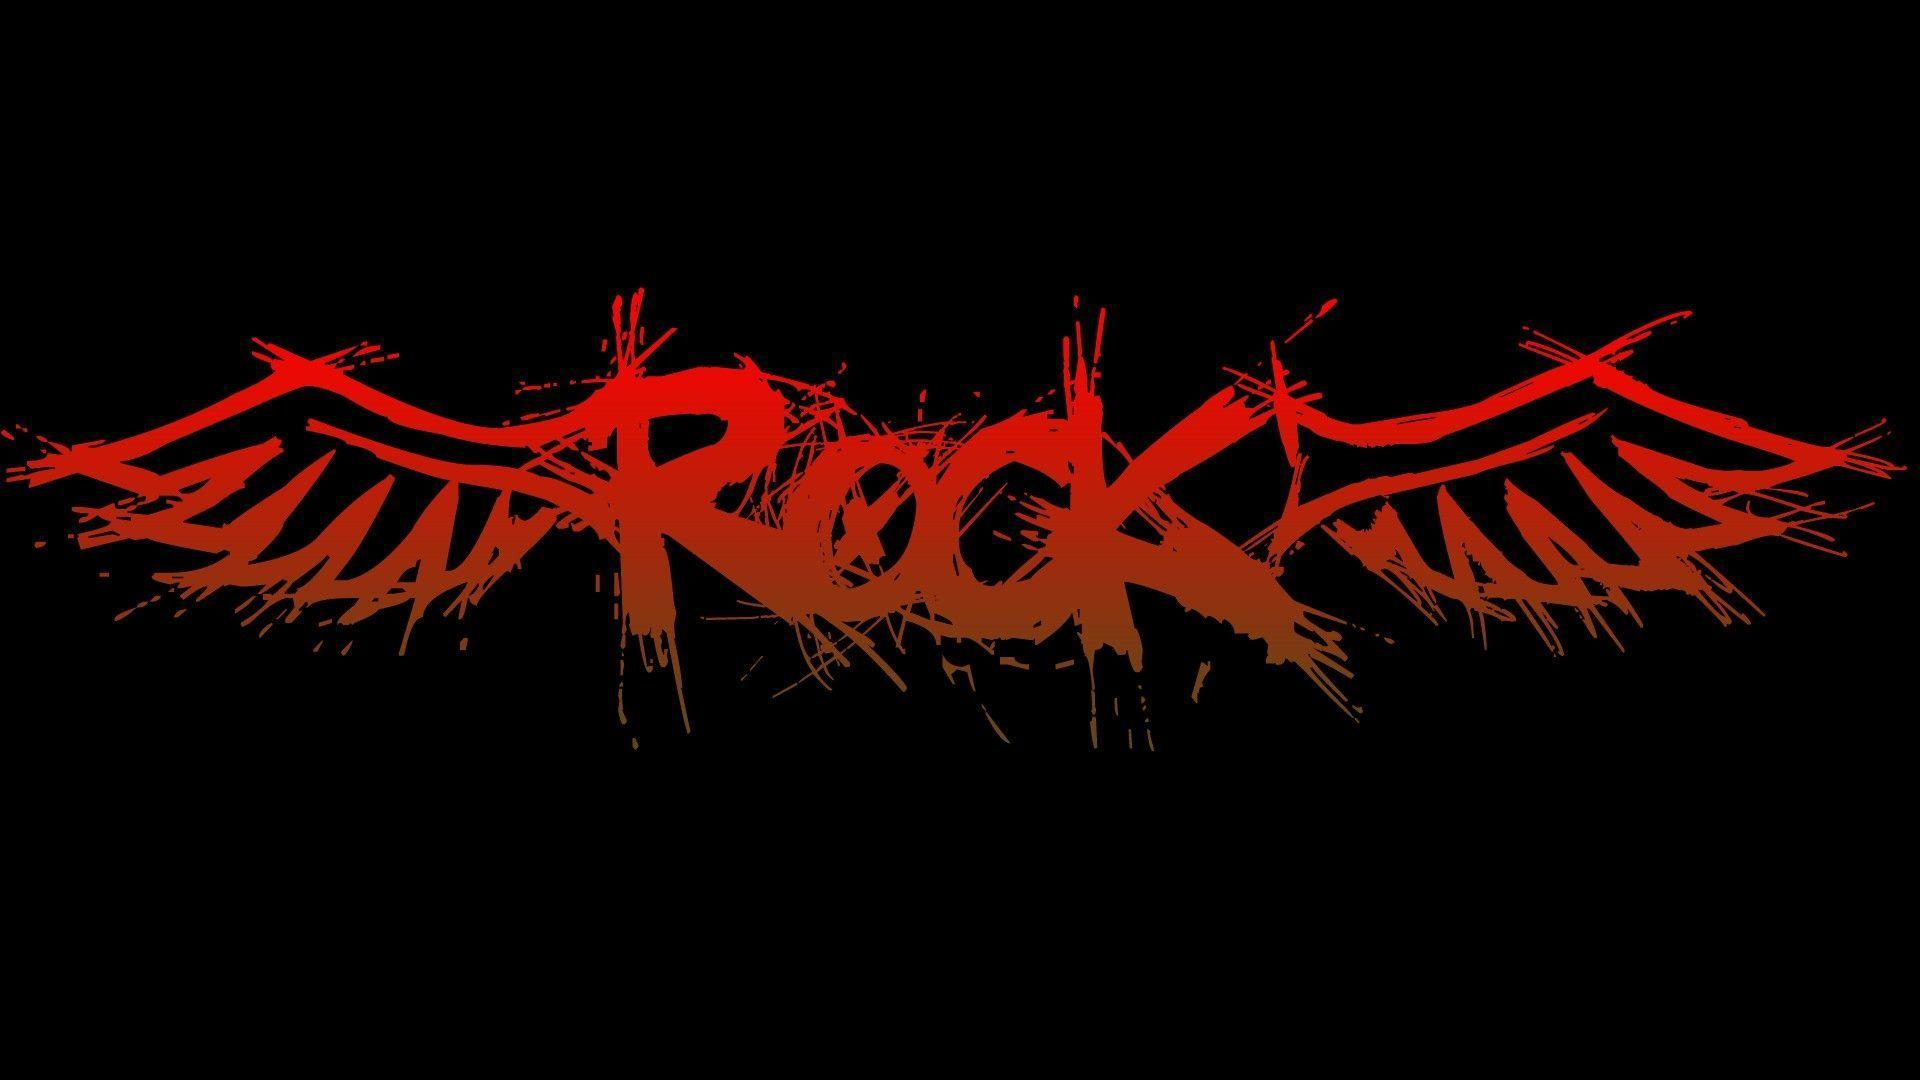 rock wallpapers - wallpaper cave